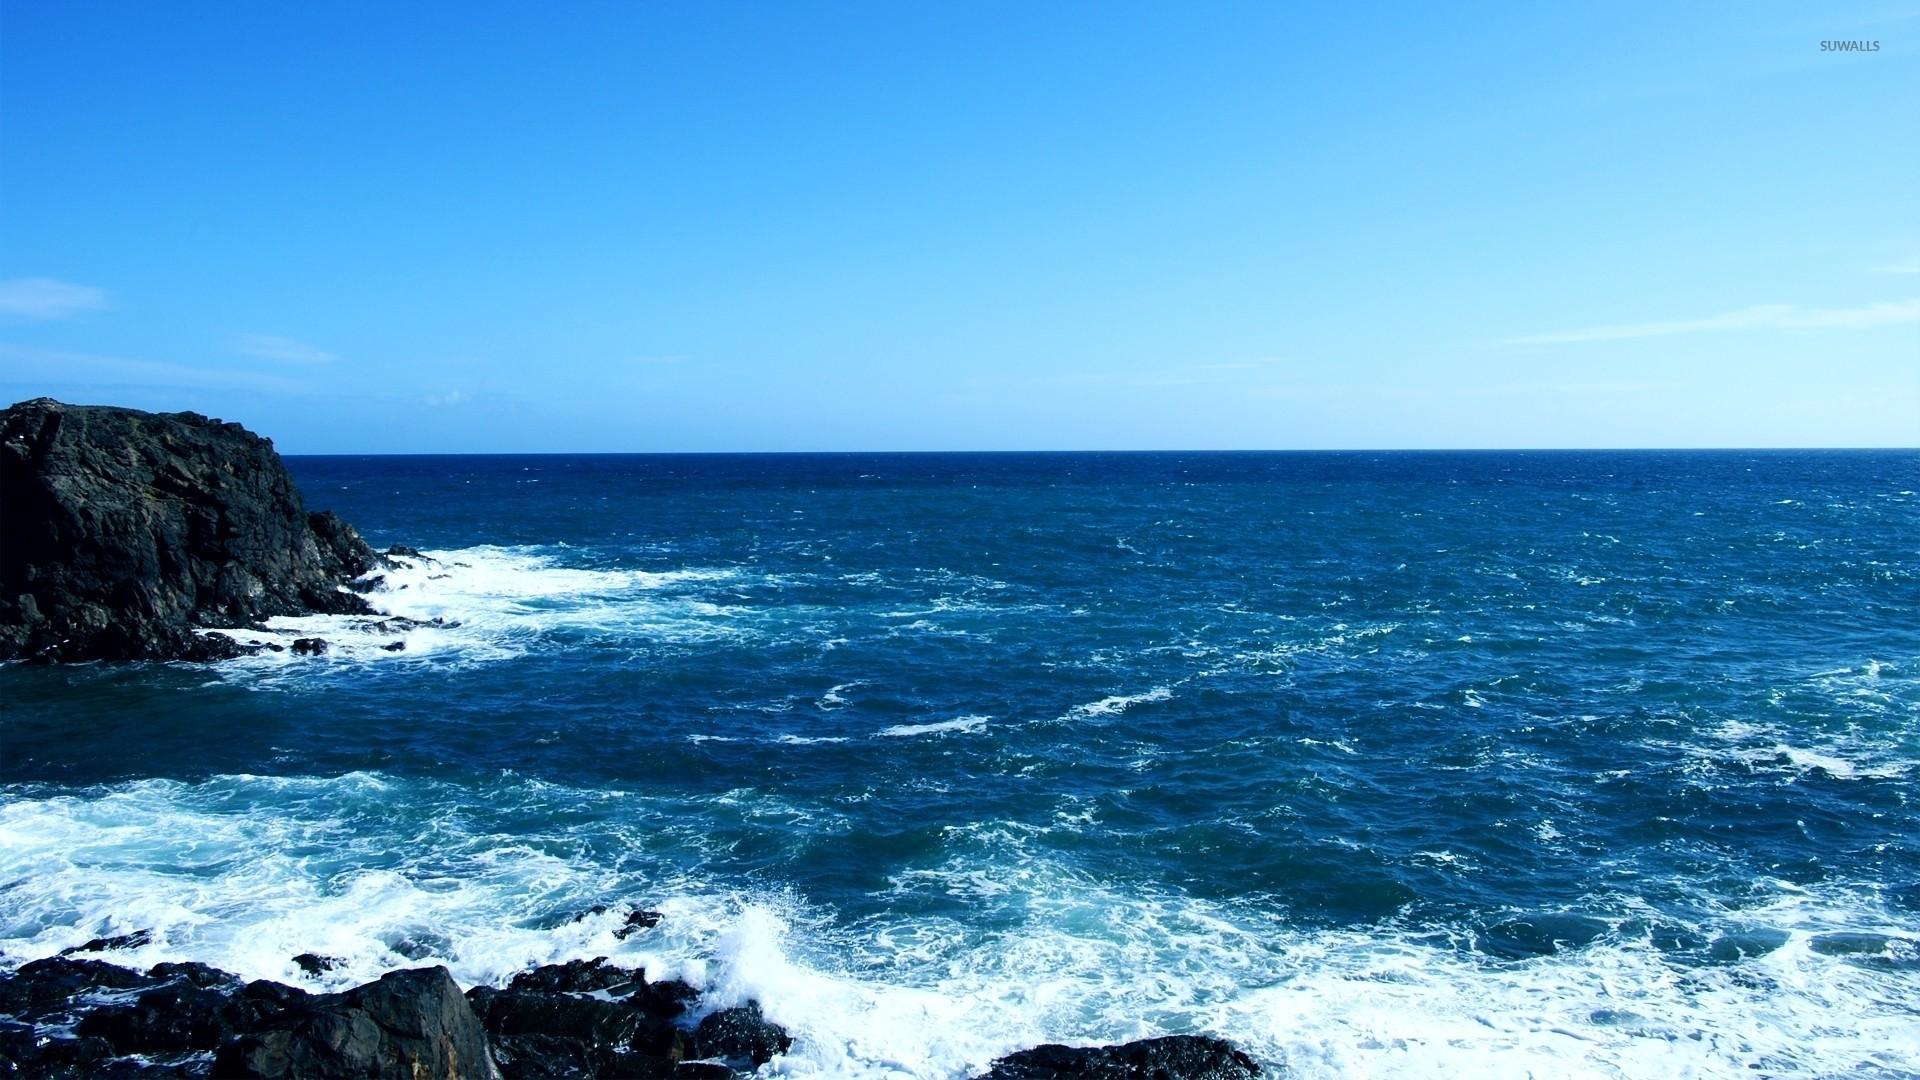 Rocks rising from the blue ocean wallpaper